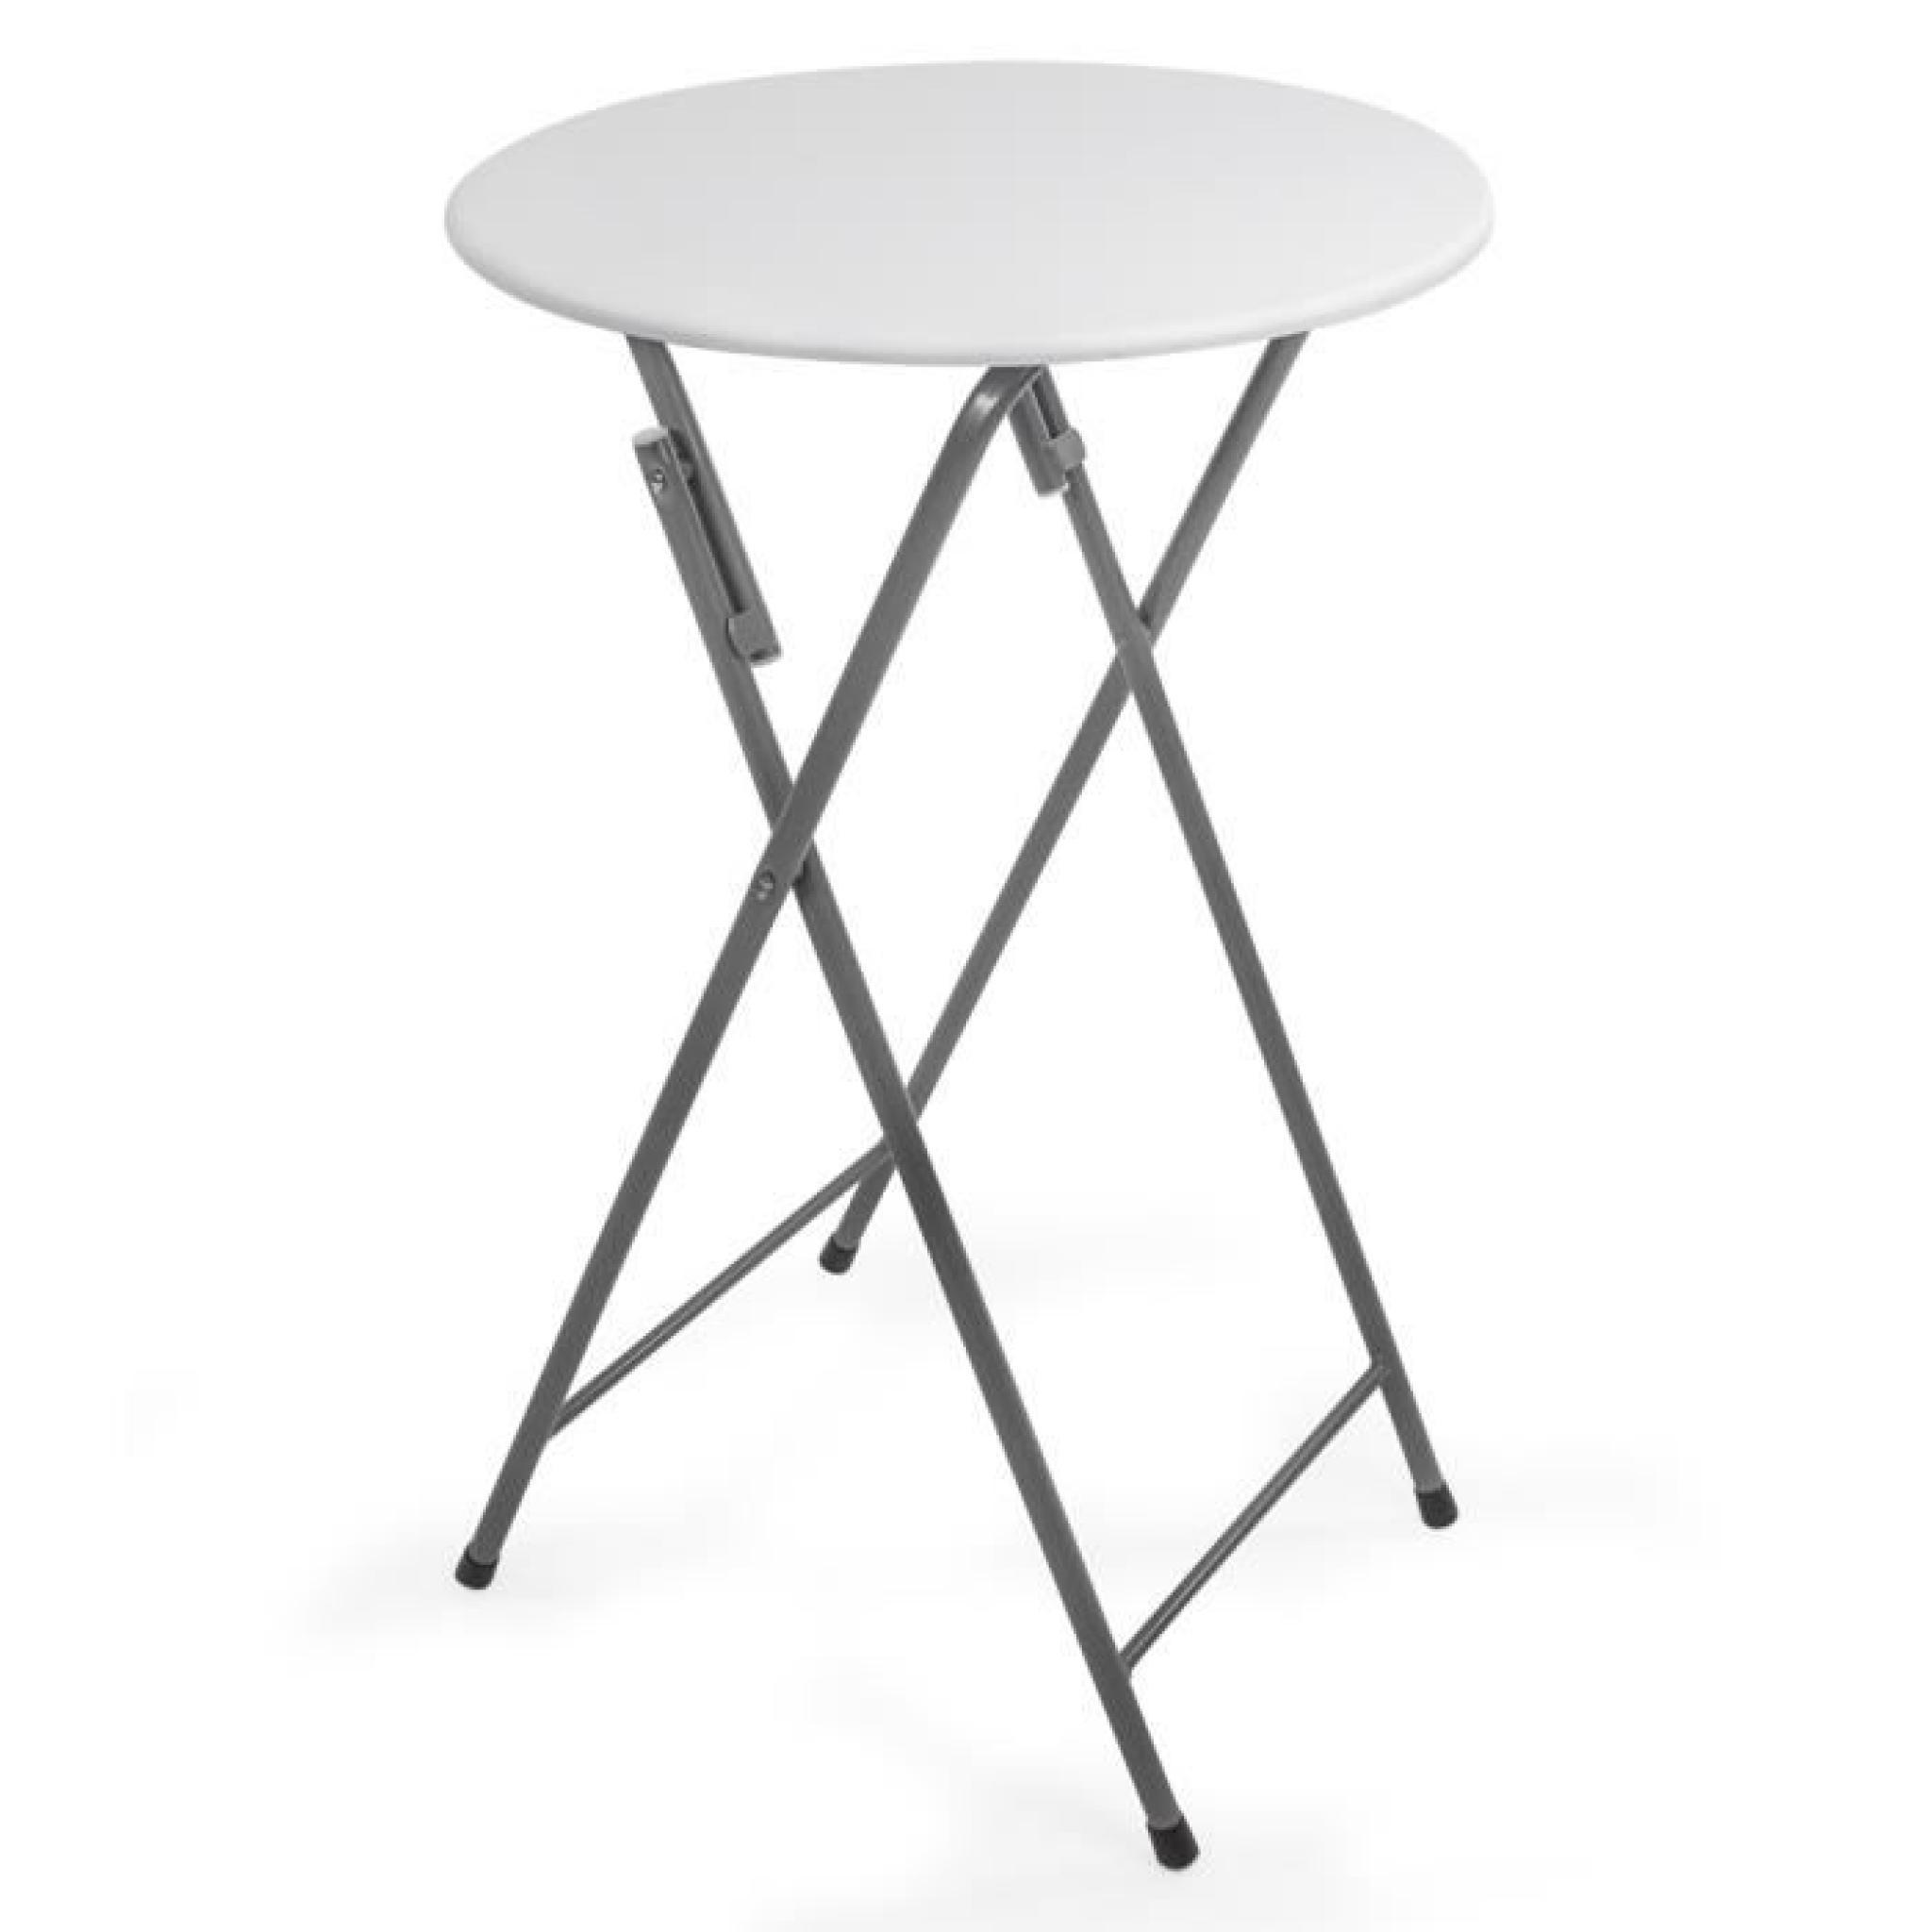 Table de bar, Table de bistro, Table Haute, Table de Jardin, Table Pliable  Ø 60 cm x 110 cm TECTAKE Blanche